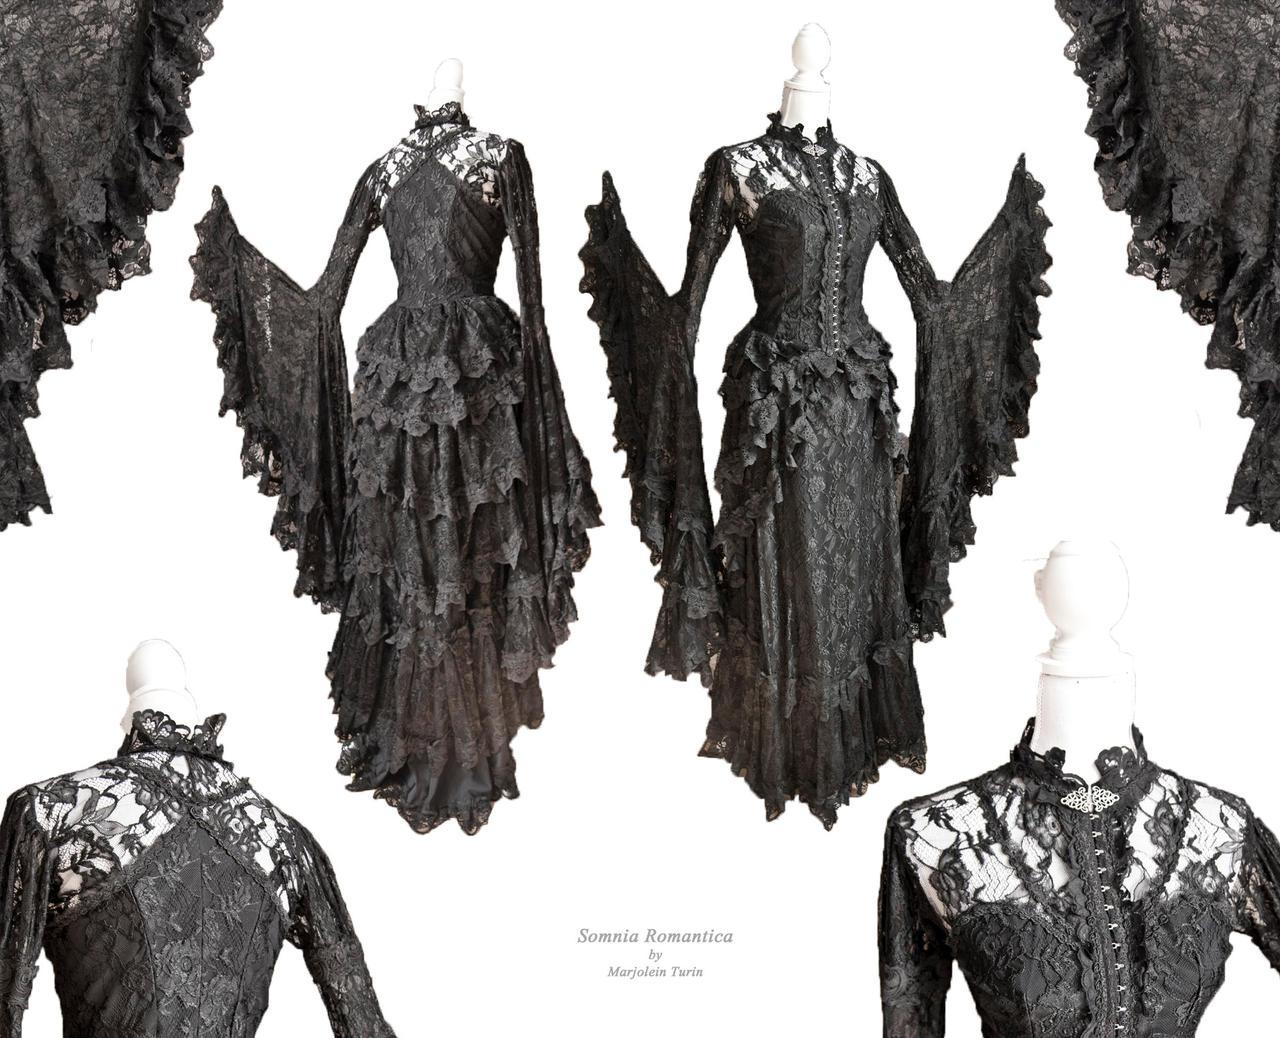 Dress Cornacchia, Somnia Romantica by M. Turin by SomniaRomantica